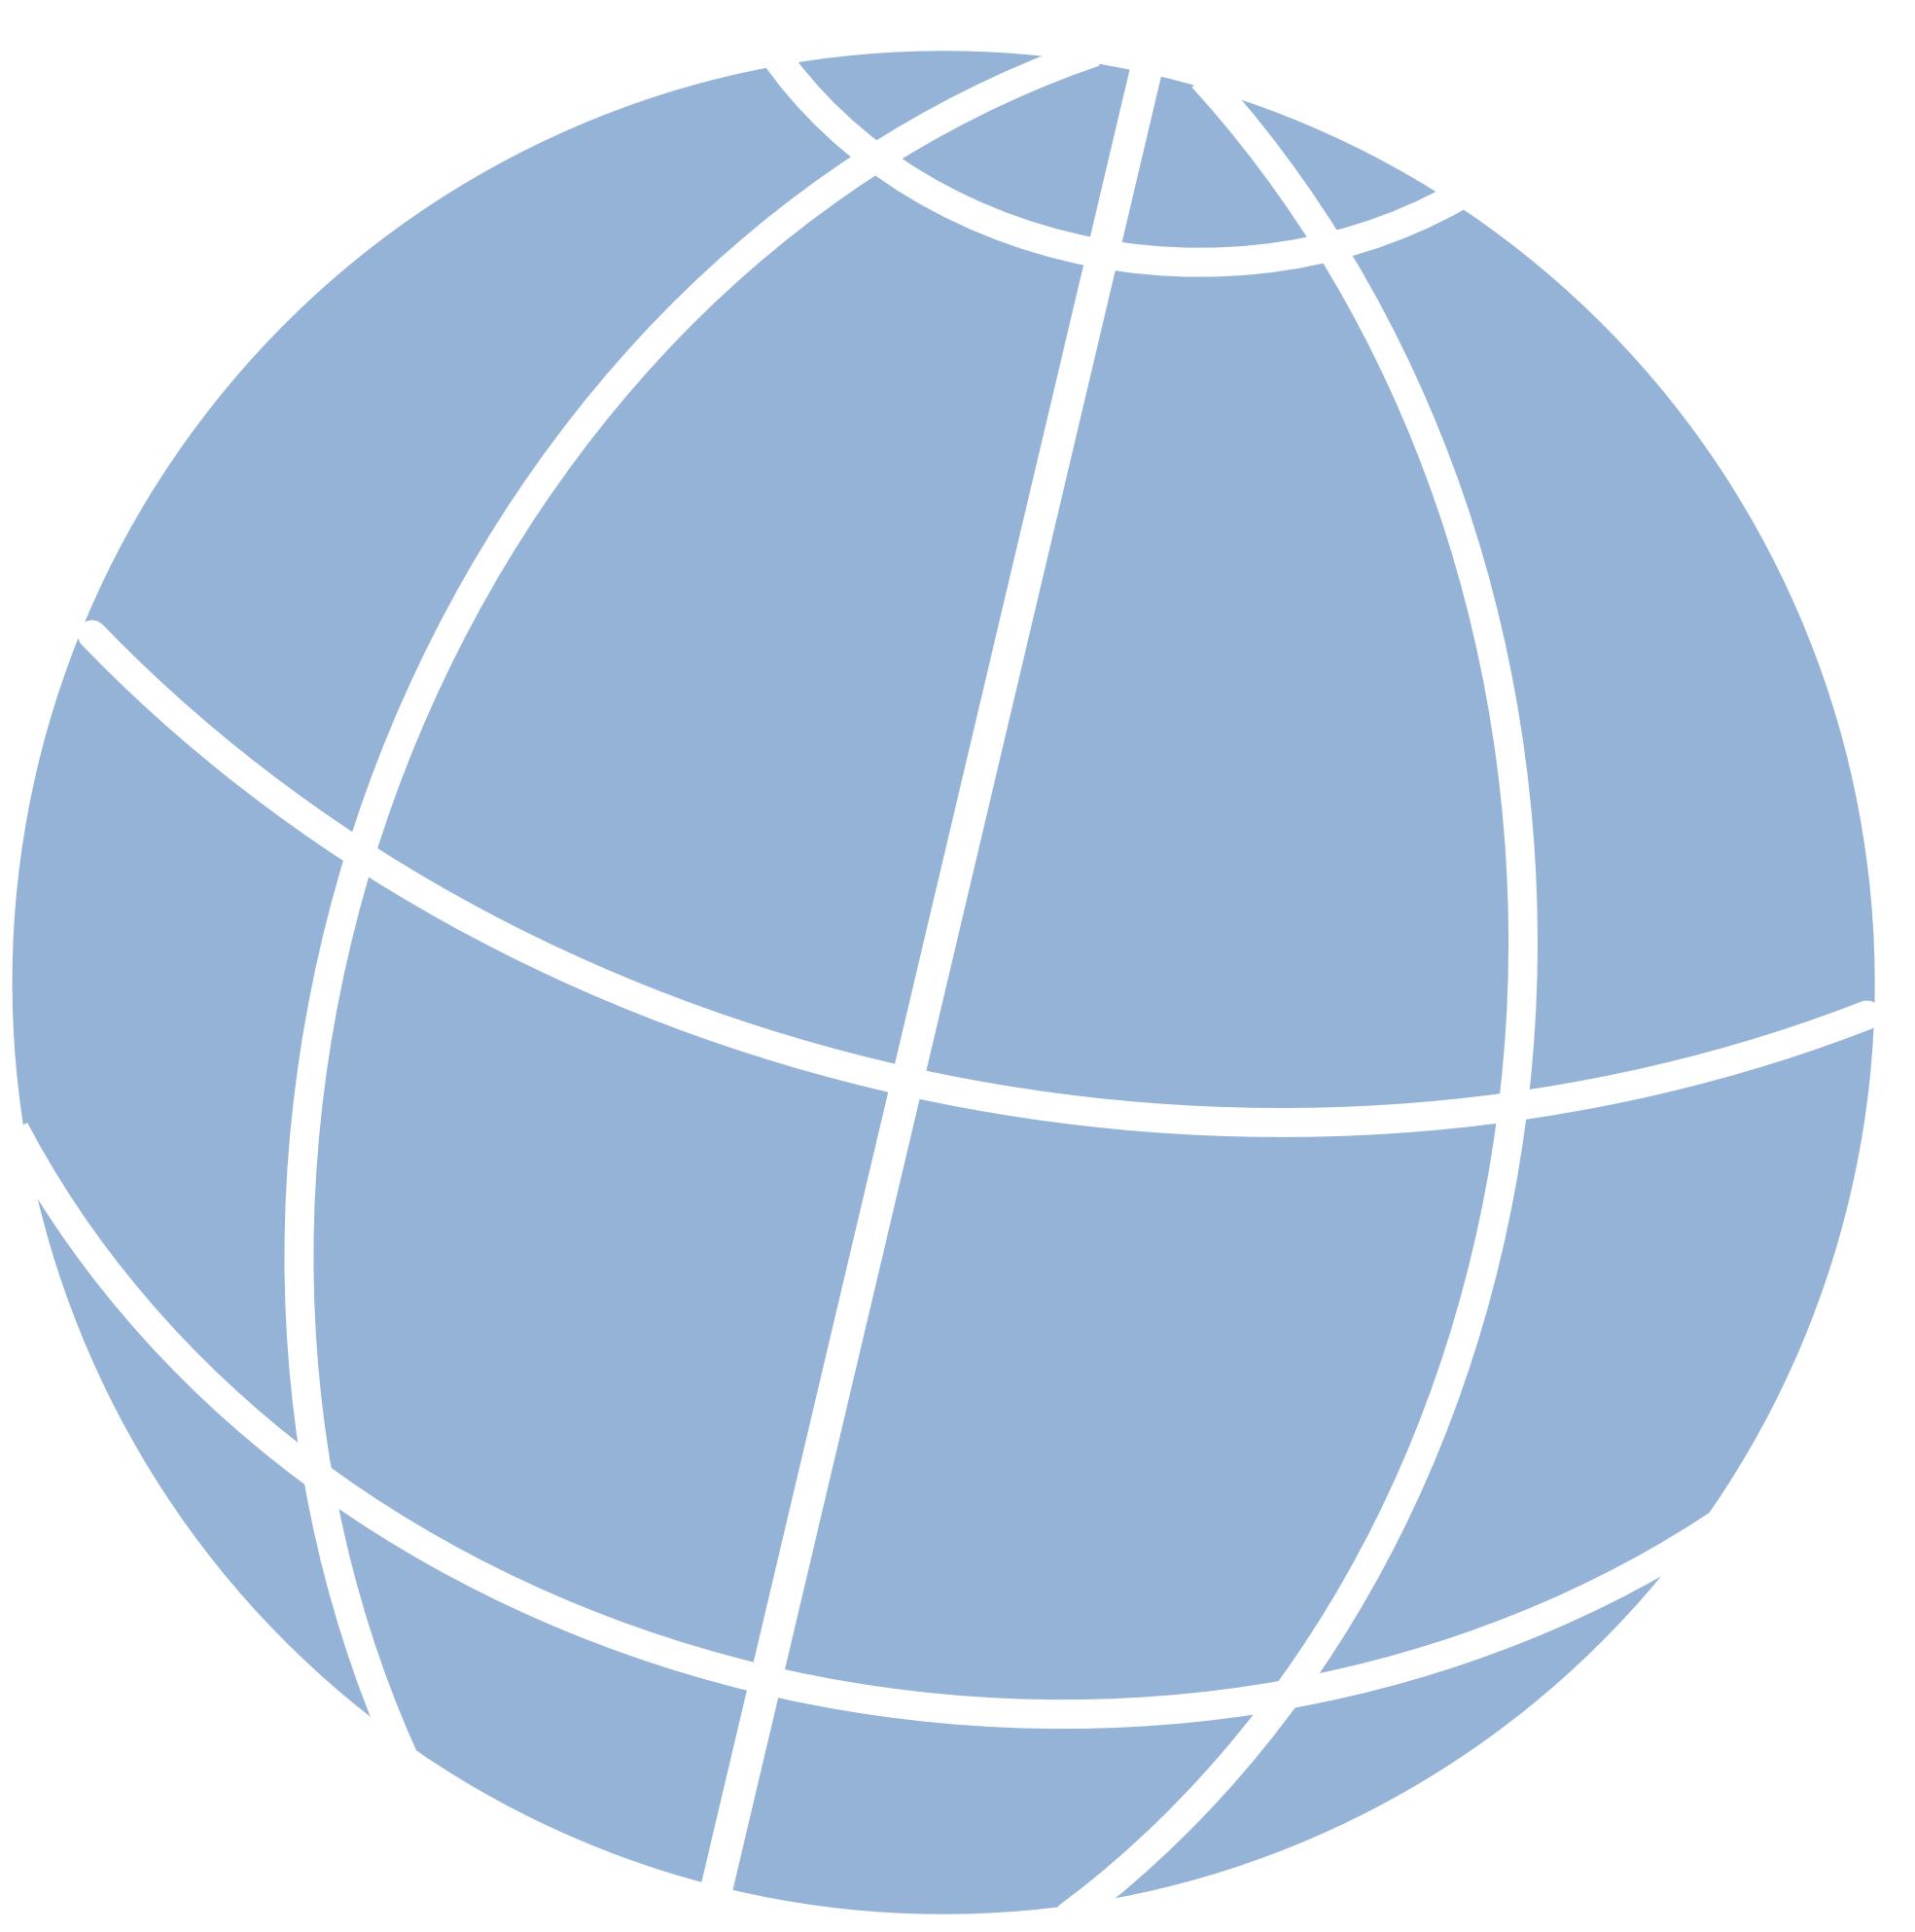 Globe Png image #39527